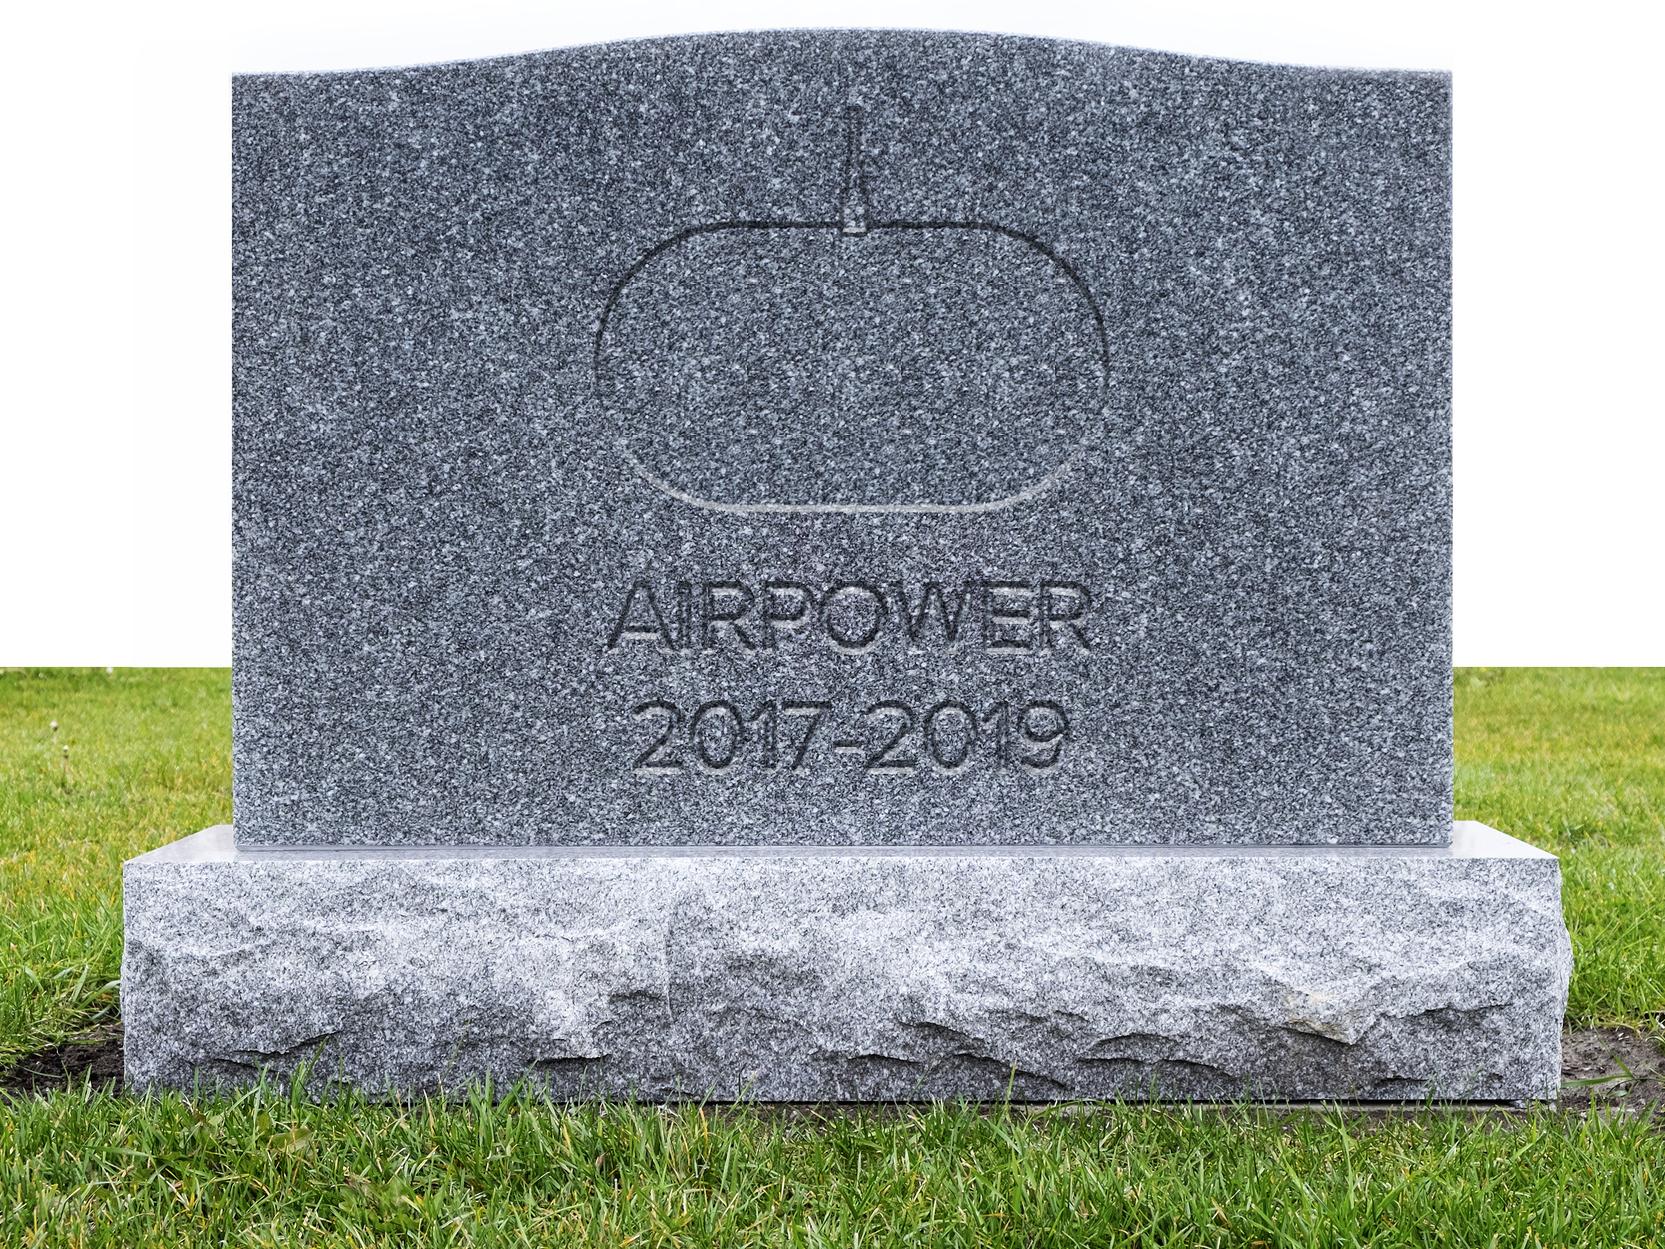 [Перевод] Что в итоге убило AirPower